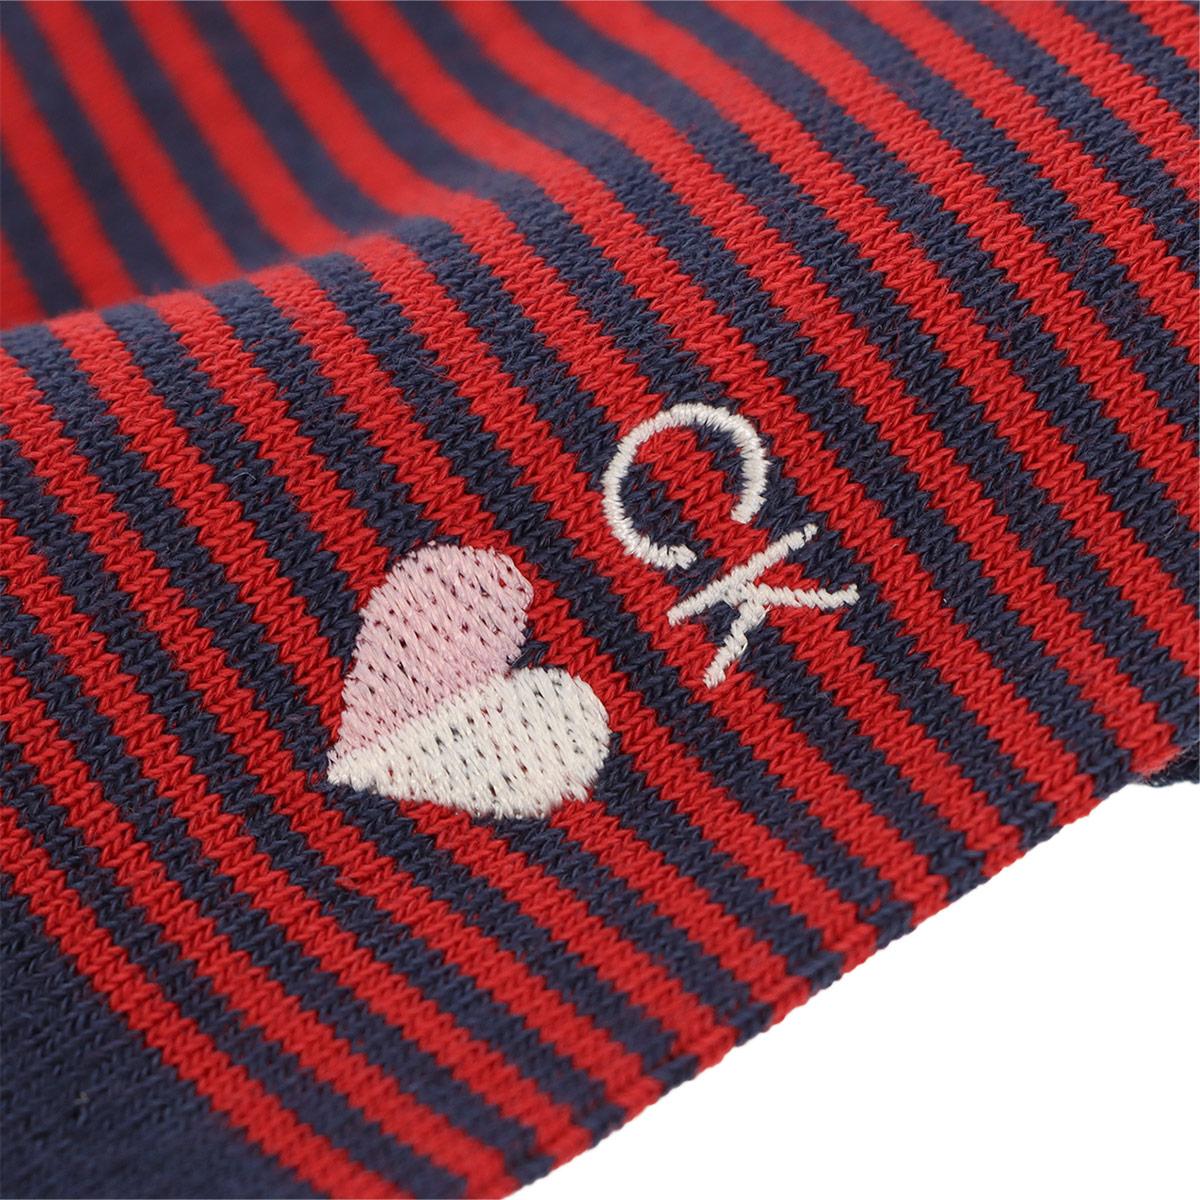 Calvin Klein カルバンクライン 日本製 カジュアル バレンタイン ボーダー柄 CKハート刺繍 クルー丈 メンズ ソックス 男性 靴下 プレゼント 贈答 ギフト 02542168【ゆうパケット・4点まで】